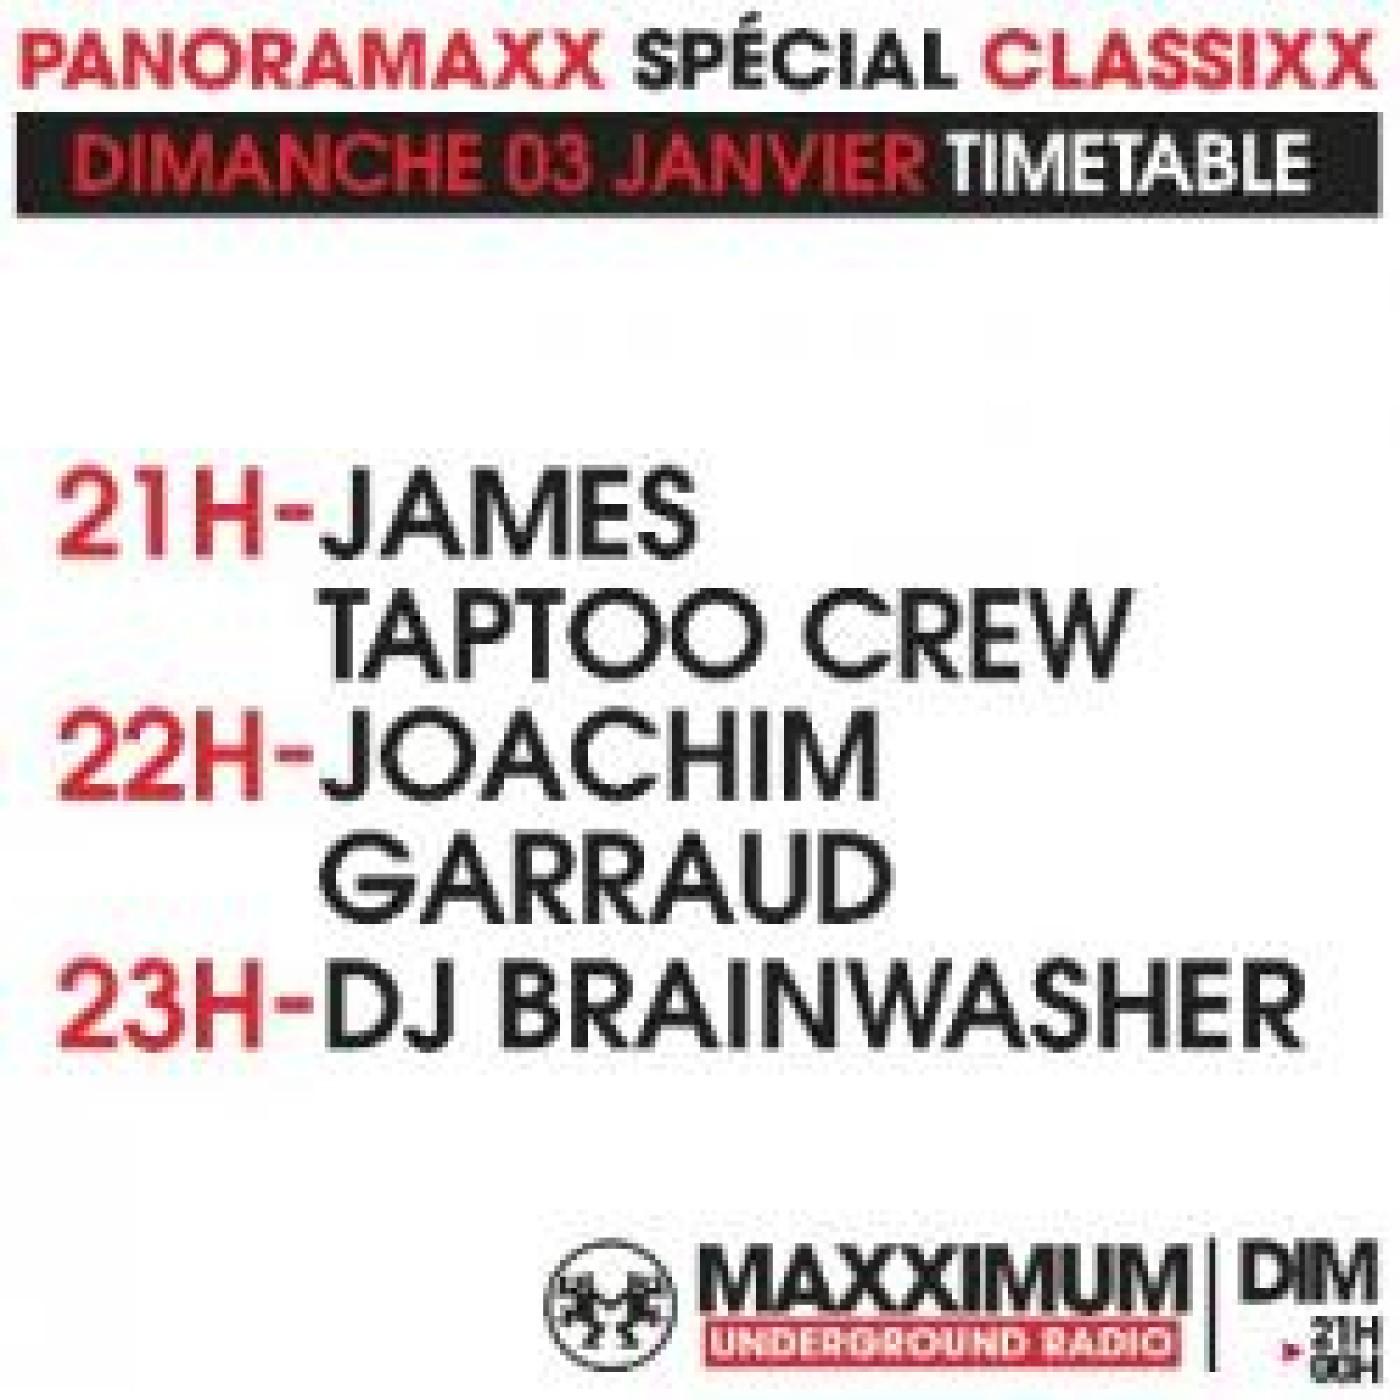 PANORAMAXX CLASSIXX : DJ BRAINWASHER